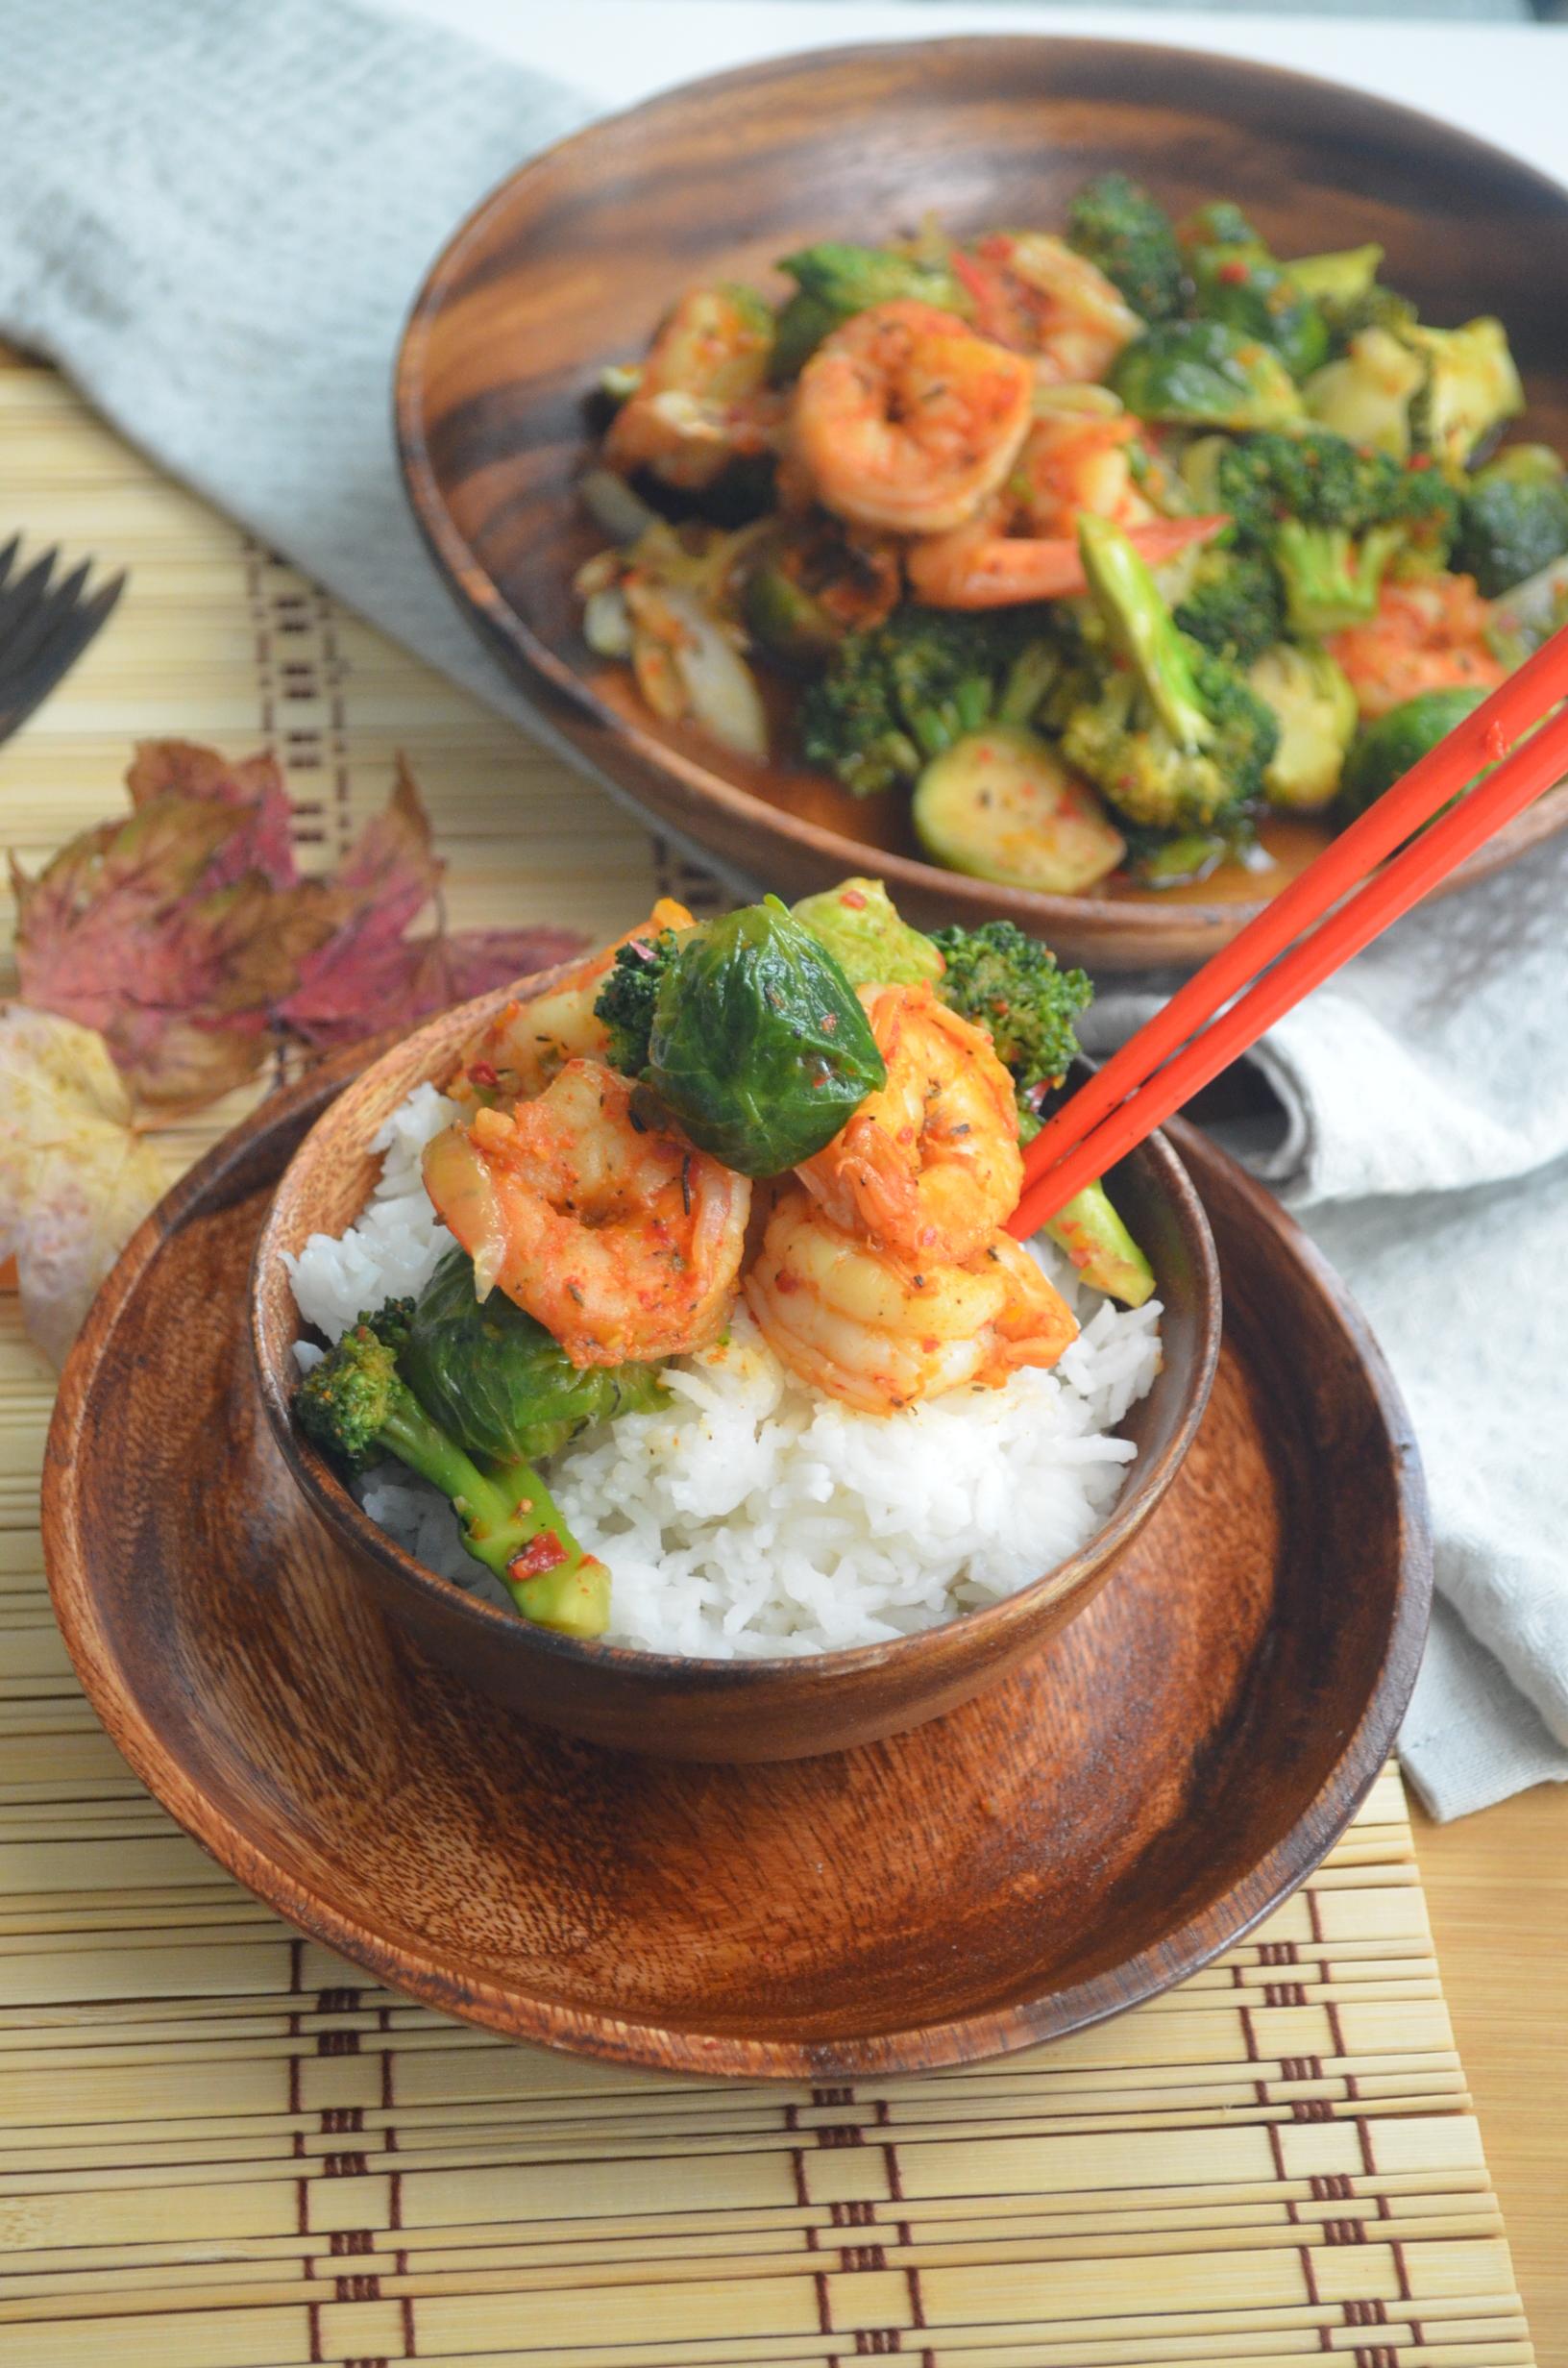 Chinese Shrimp and Broccoli Stir Fry